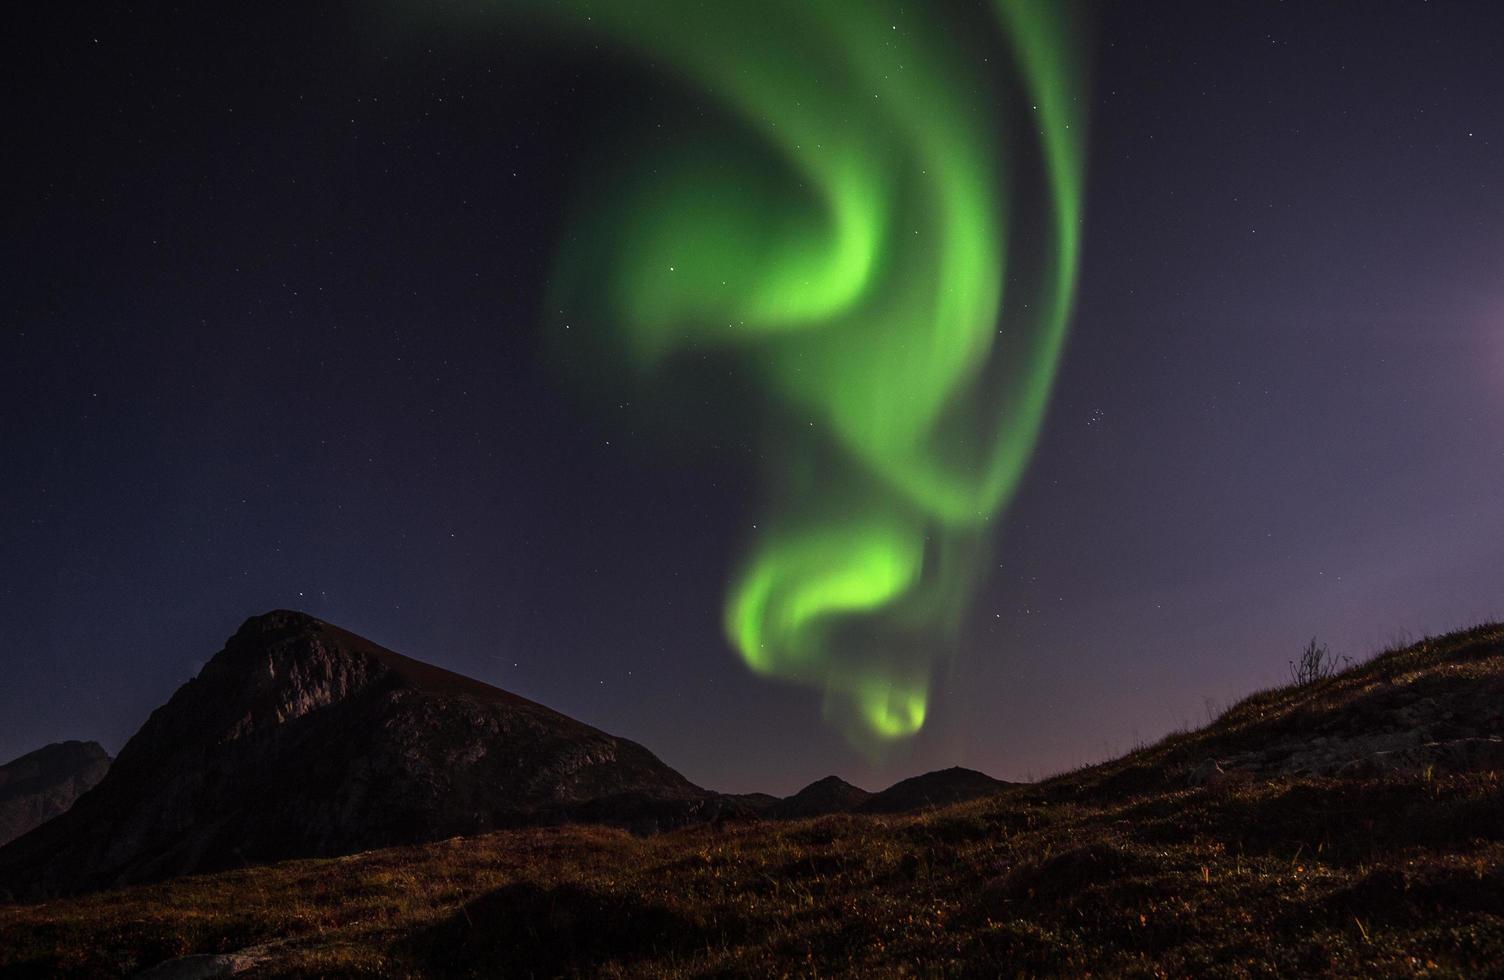 Aurora borealis lights in Lofoten photo